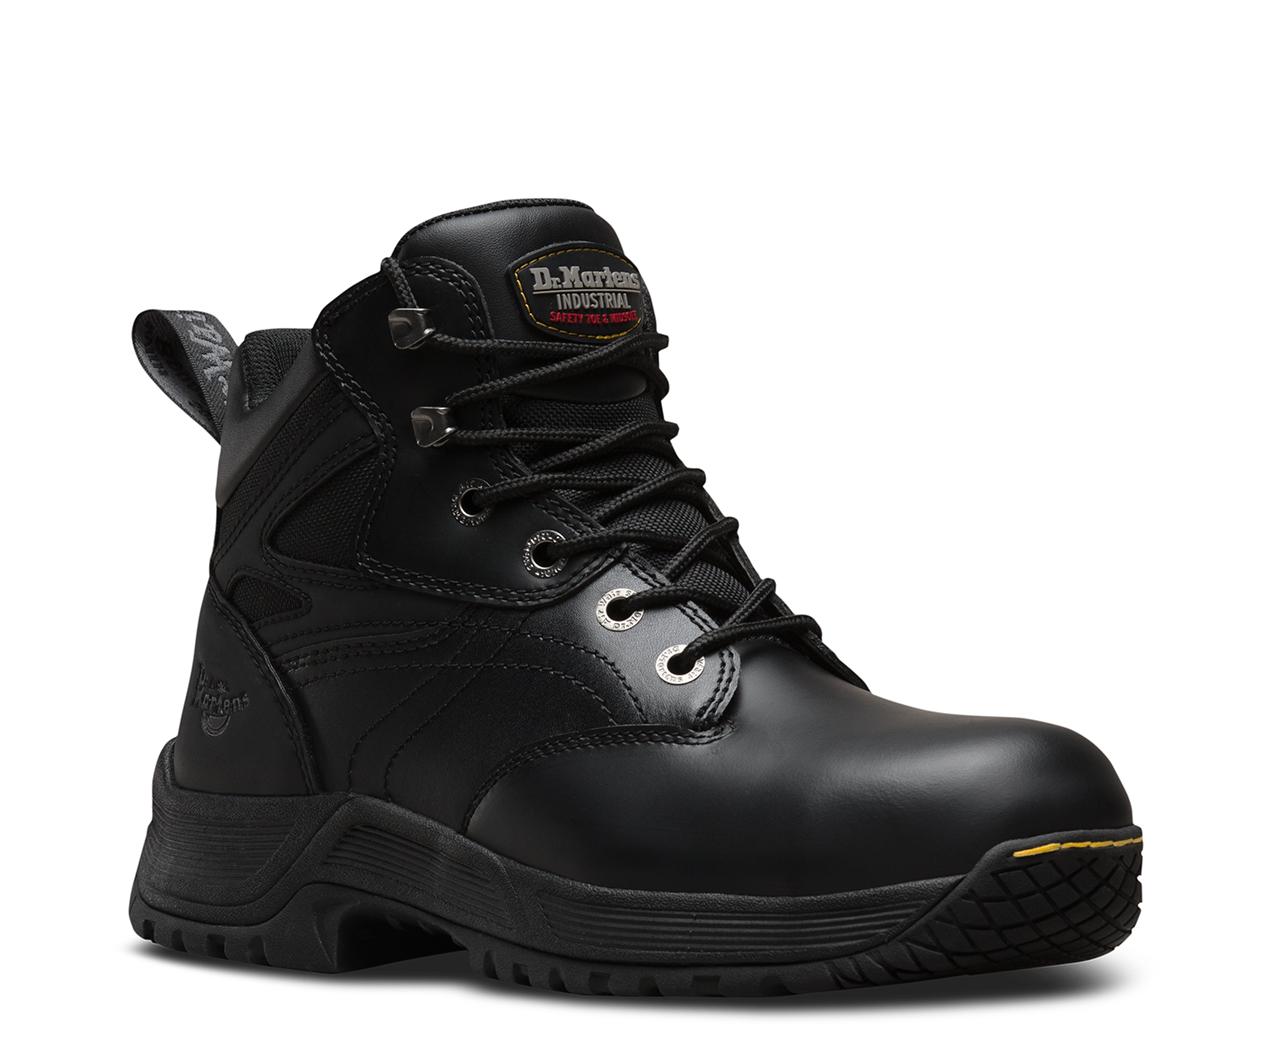 Torness Steel Toe Men S Work Boots Amp Shoes Dr Martens Official Site